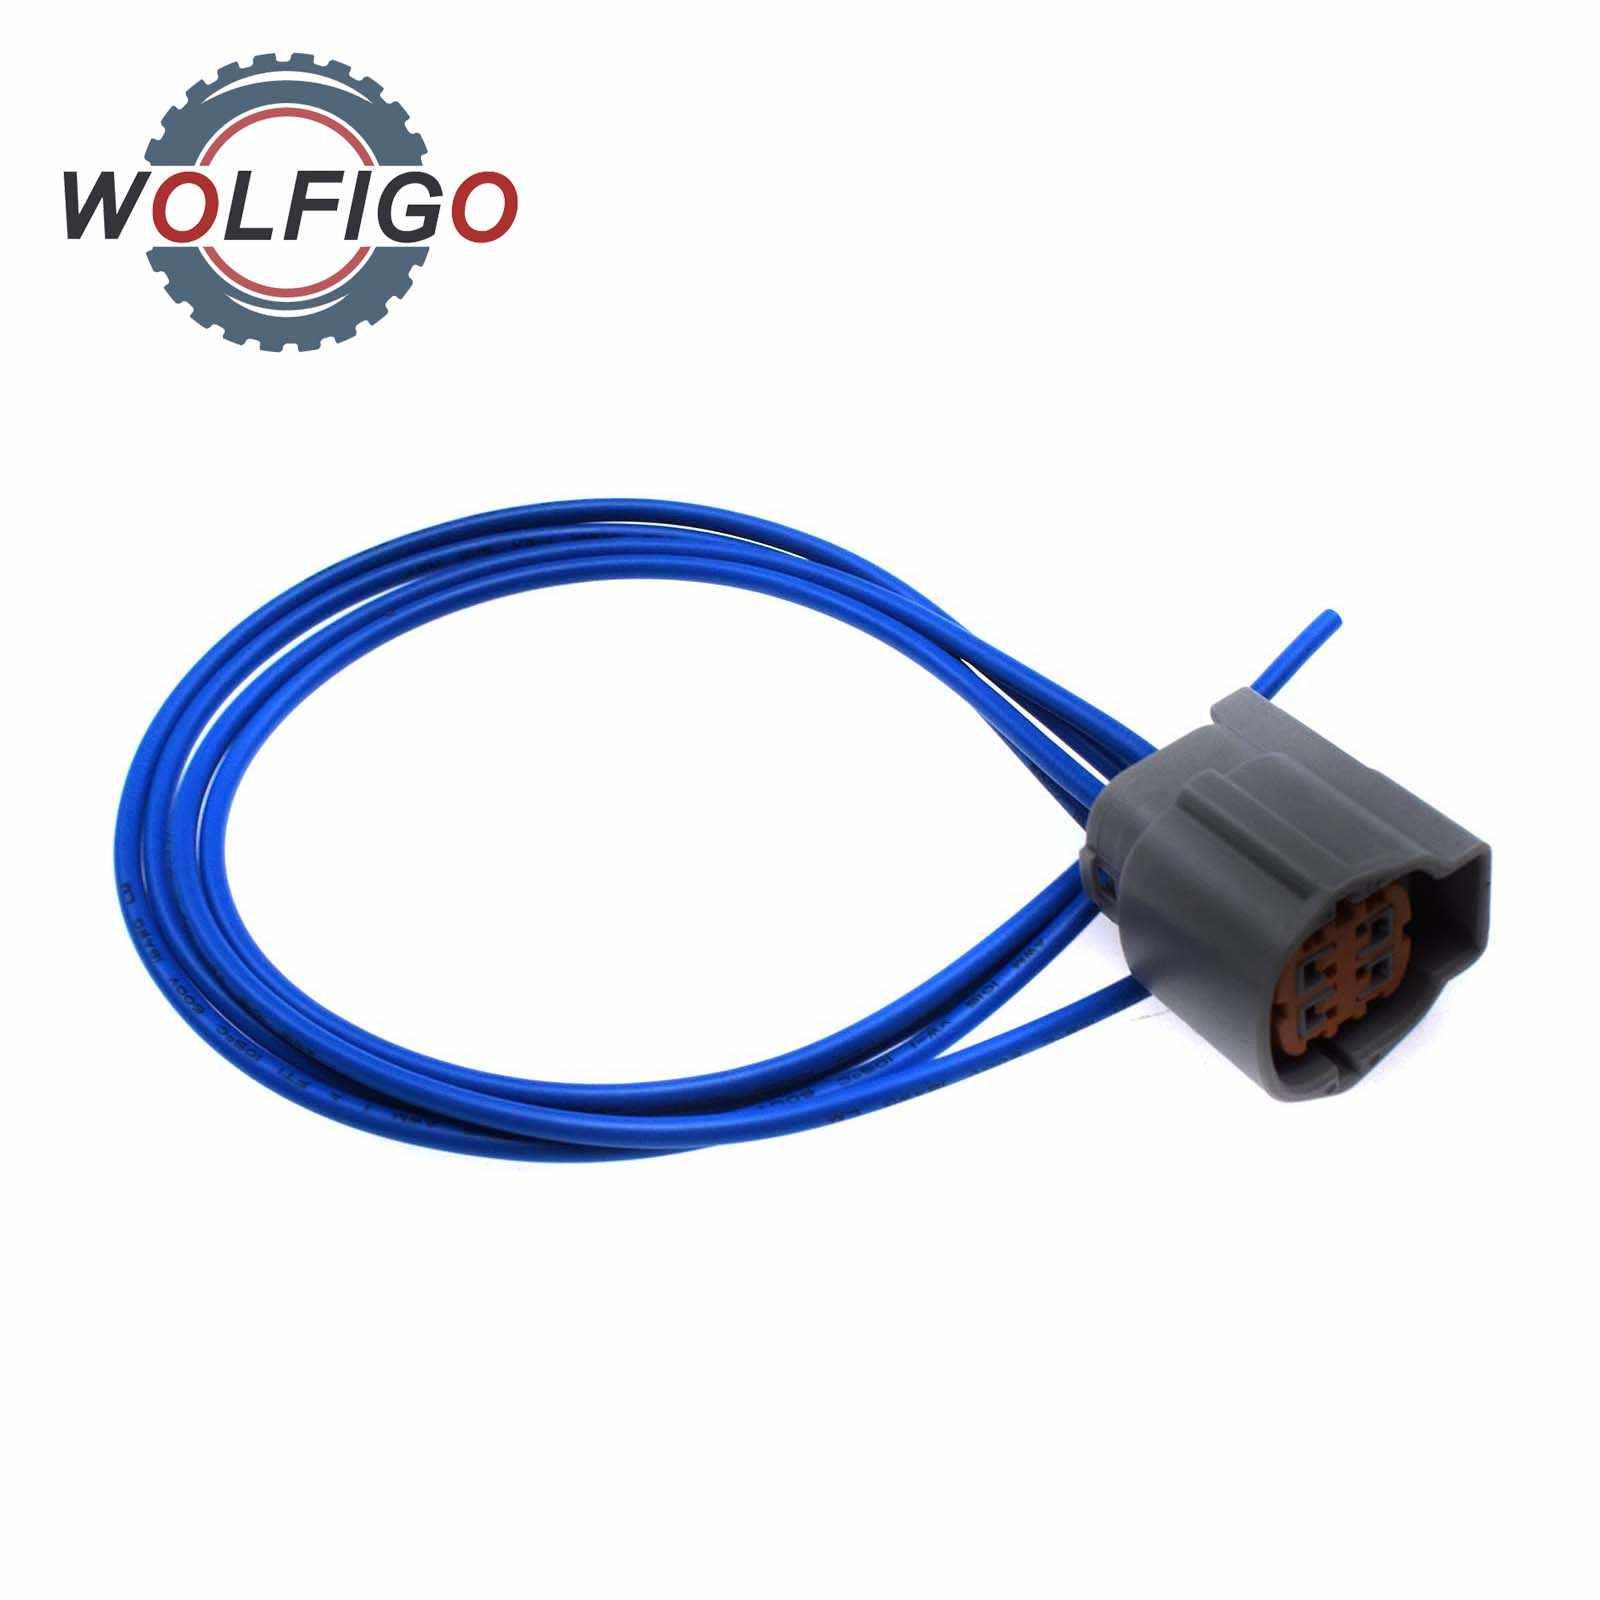 wolfigo o2 oxygen sensor connector pigtail harness for nissan subaru  infiniti rs04fg|exhaust gas oxygen sensor| - aliexpress  aliexpress